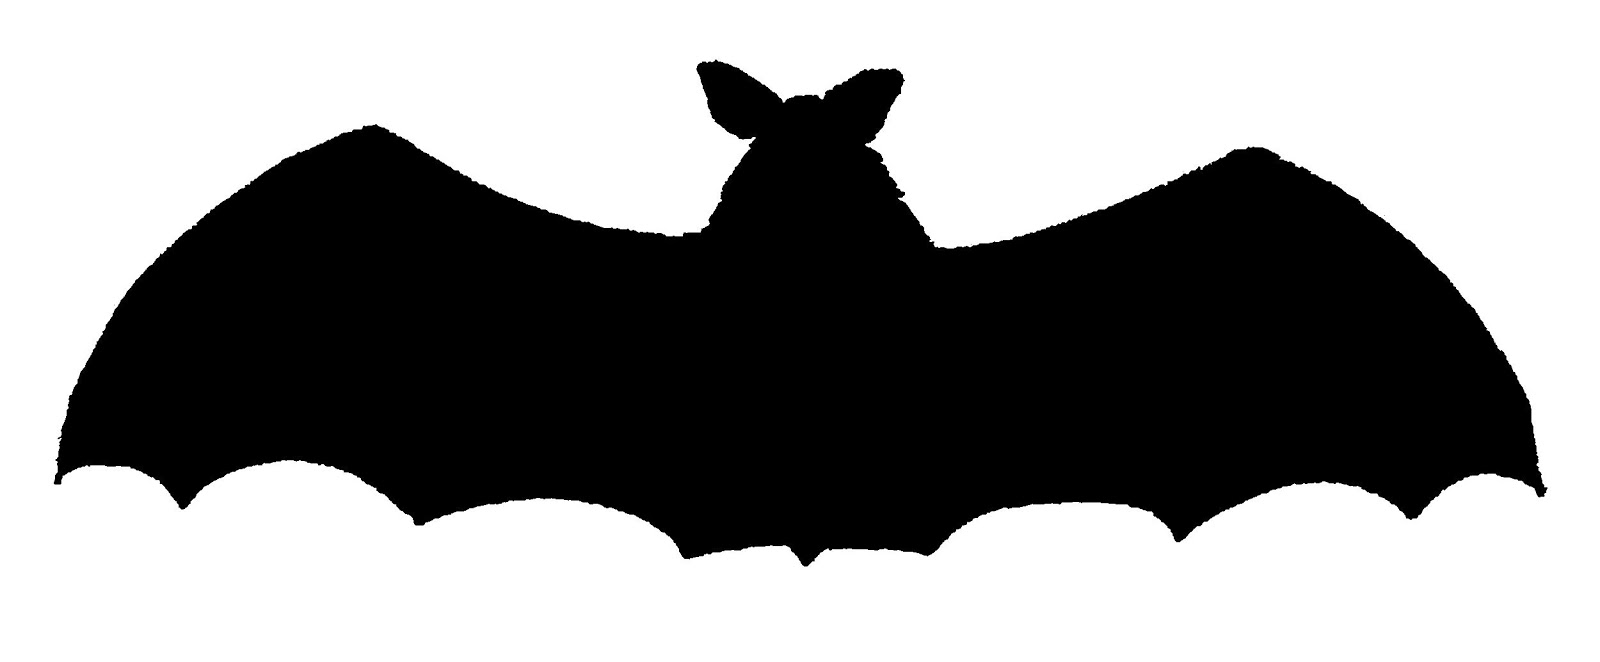 1600x662 Digital Stamp Design Royalty Free Halloween Bat Silhouette